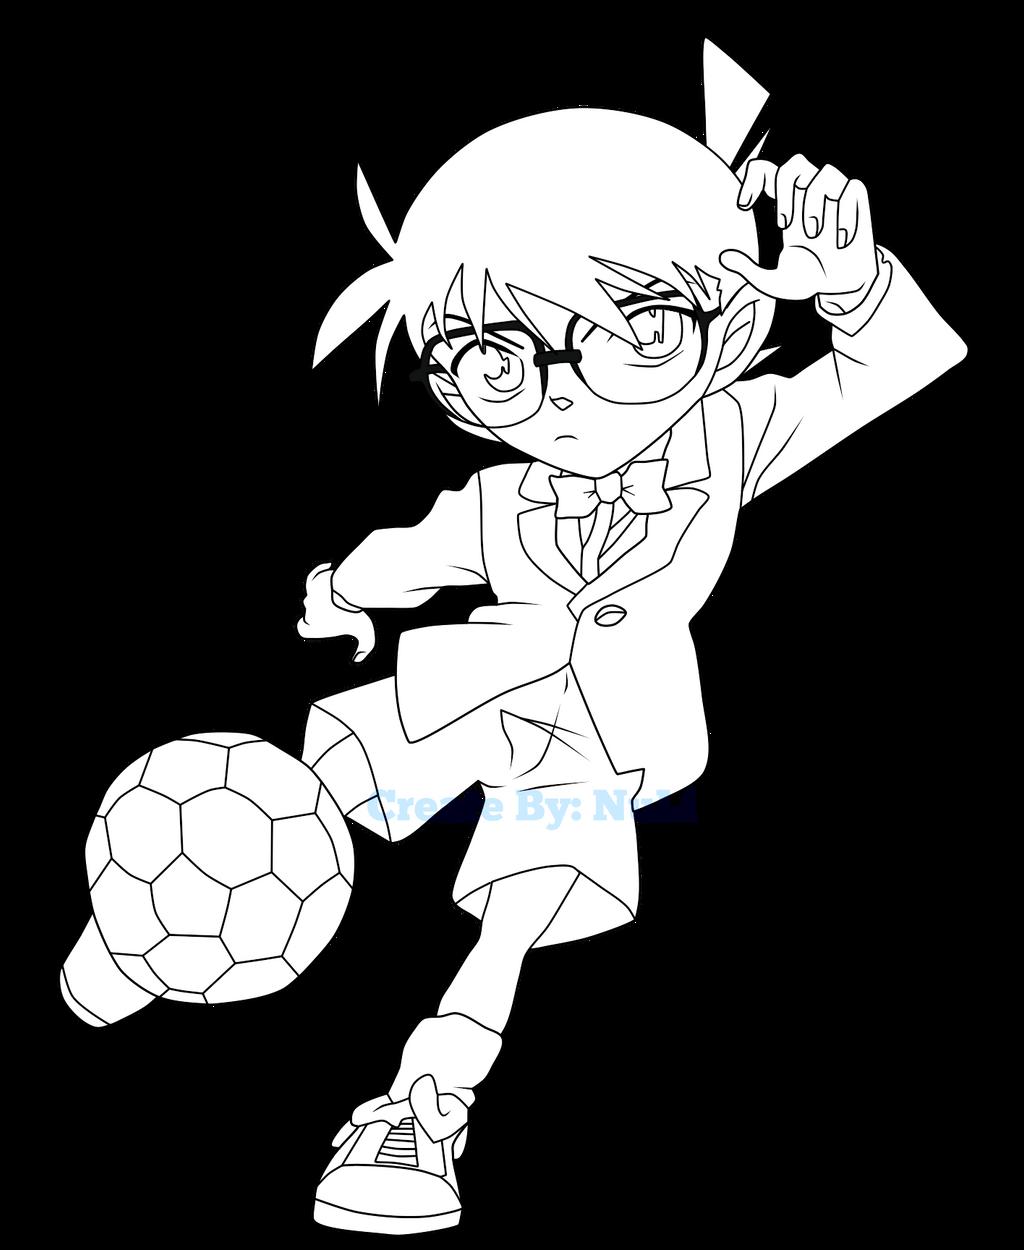 Conan Strike Sketch Ball Kick By Tranexxx On Deviantart